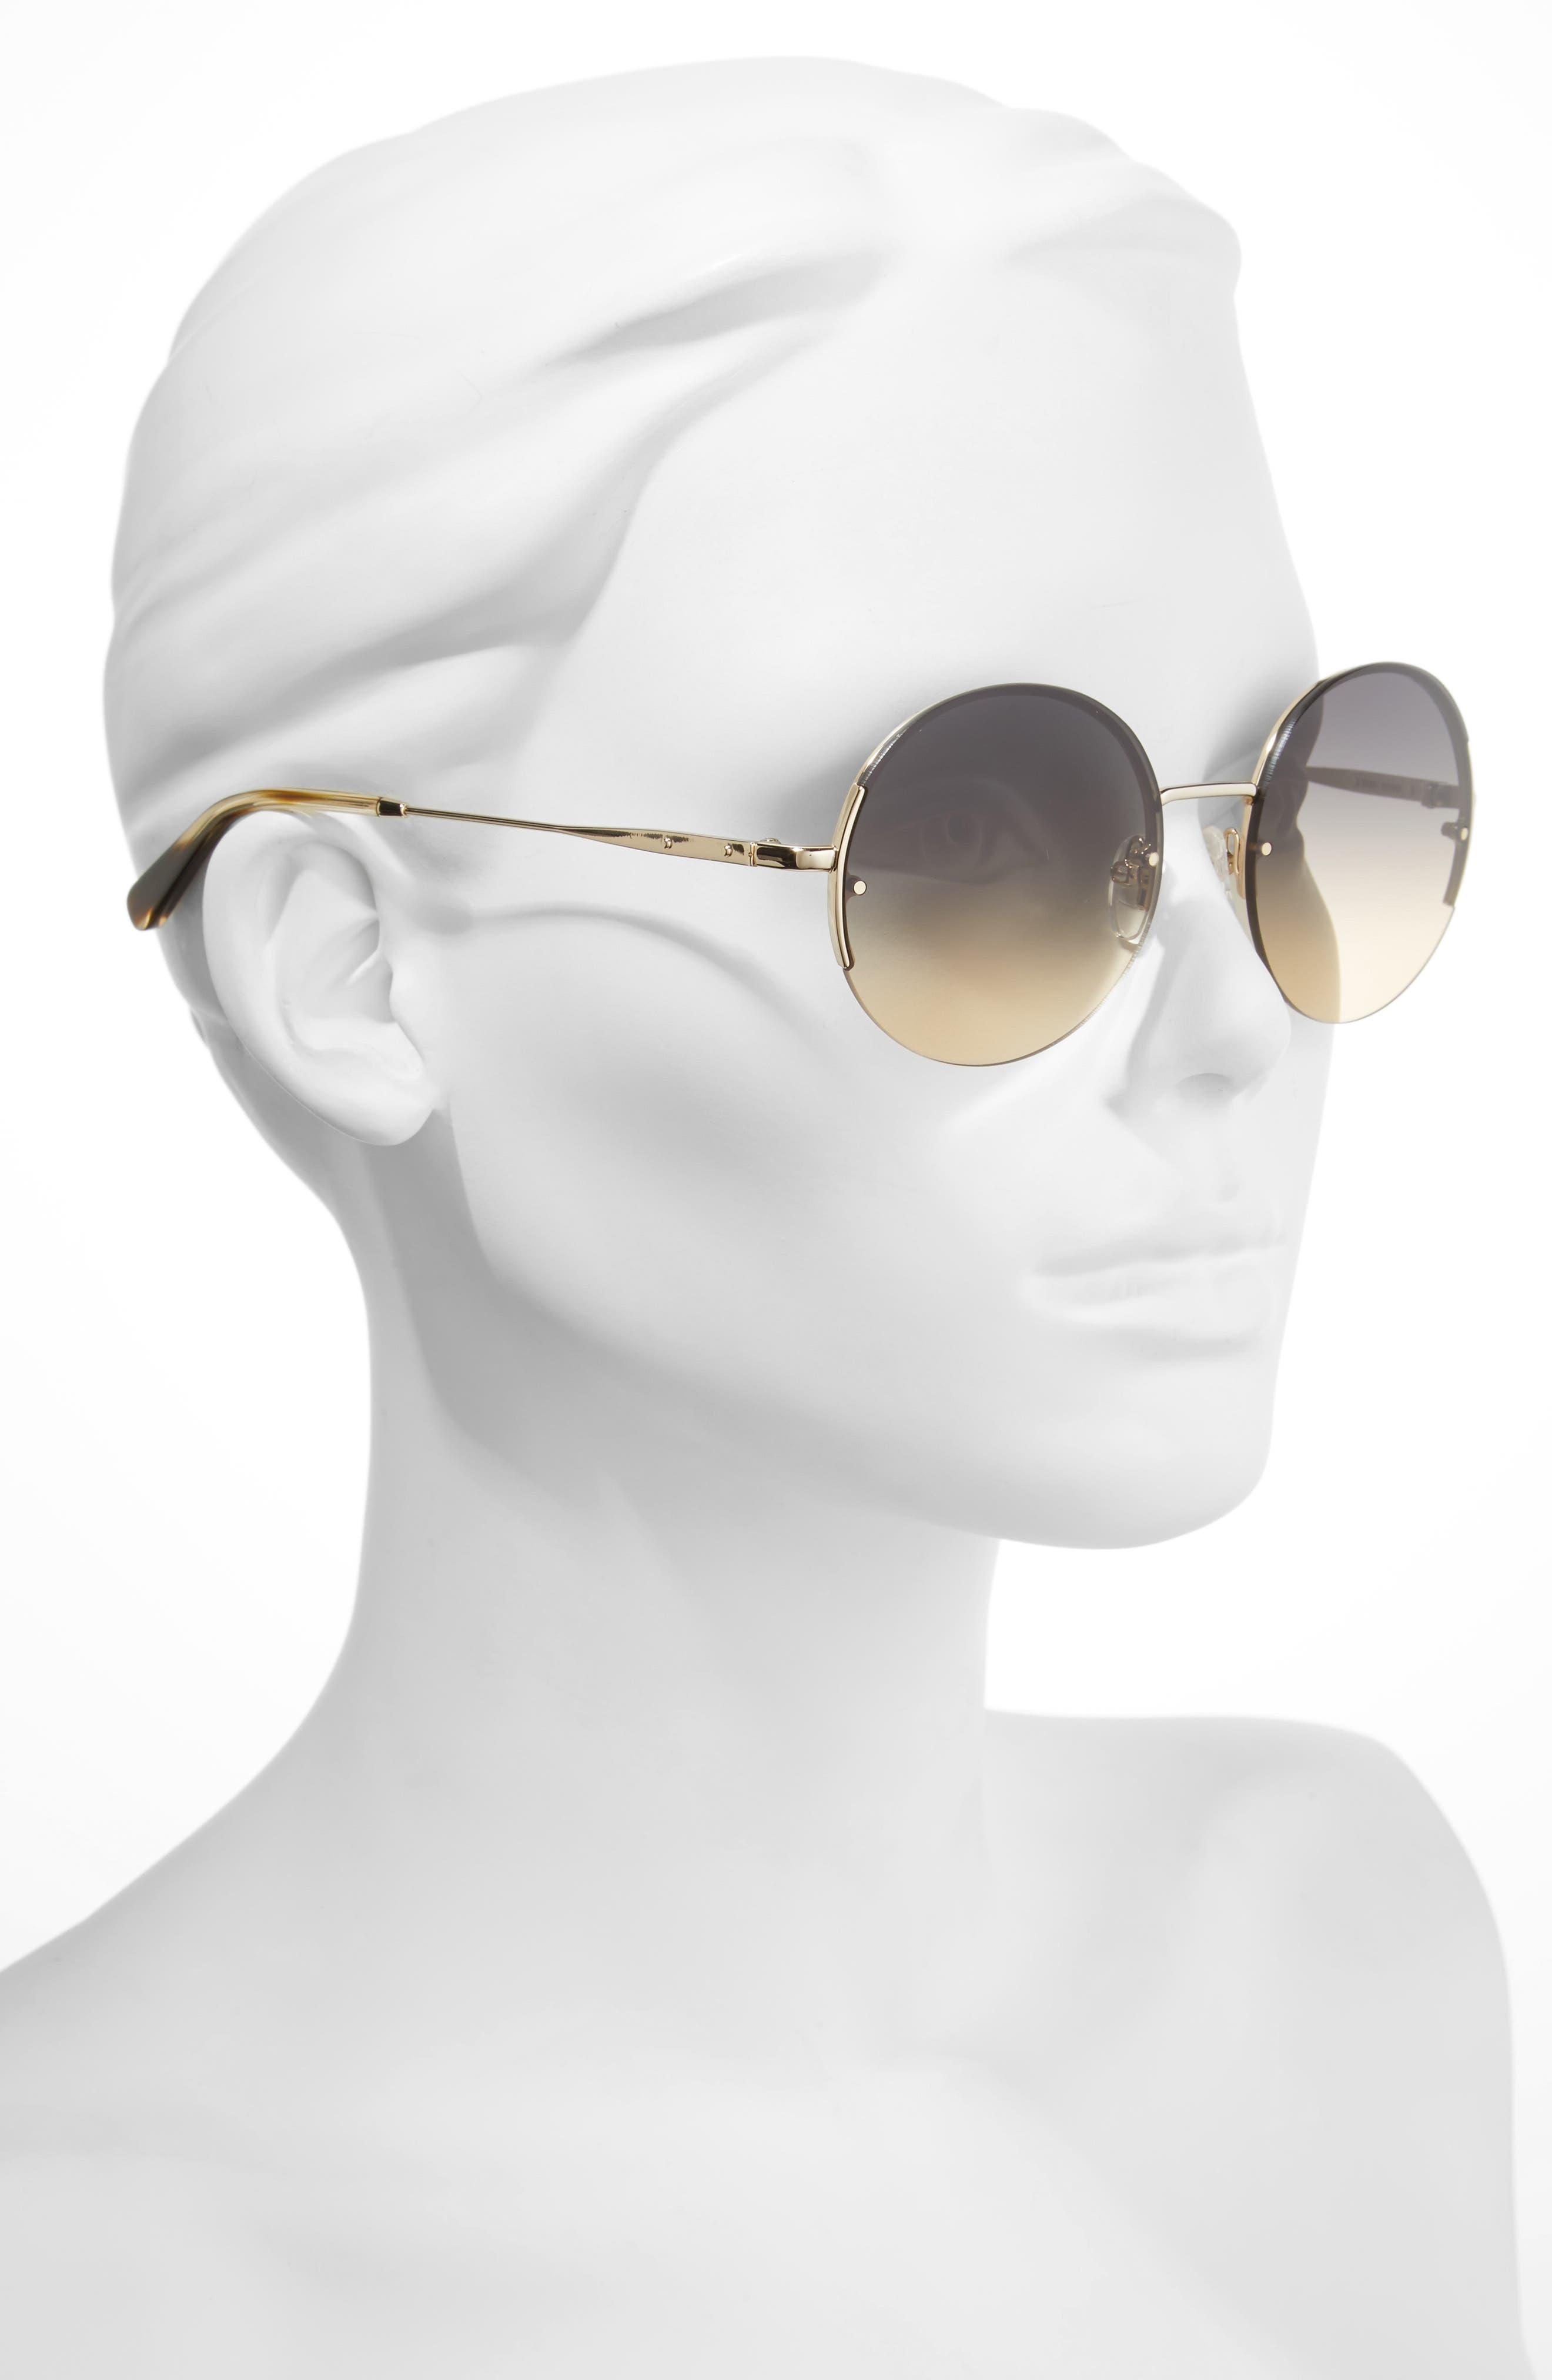 55mm Round Sunglasses,                             Alternate thumbnail 2, color,                             Endura Gold